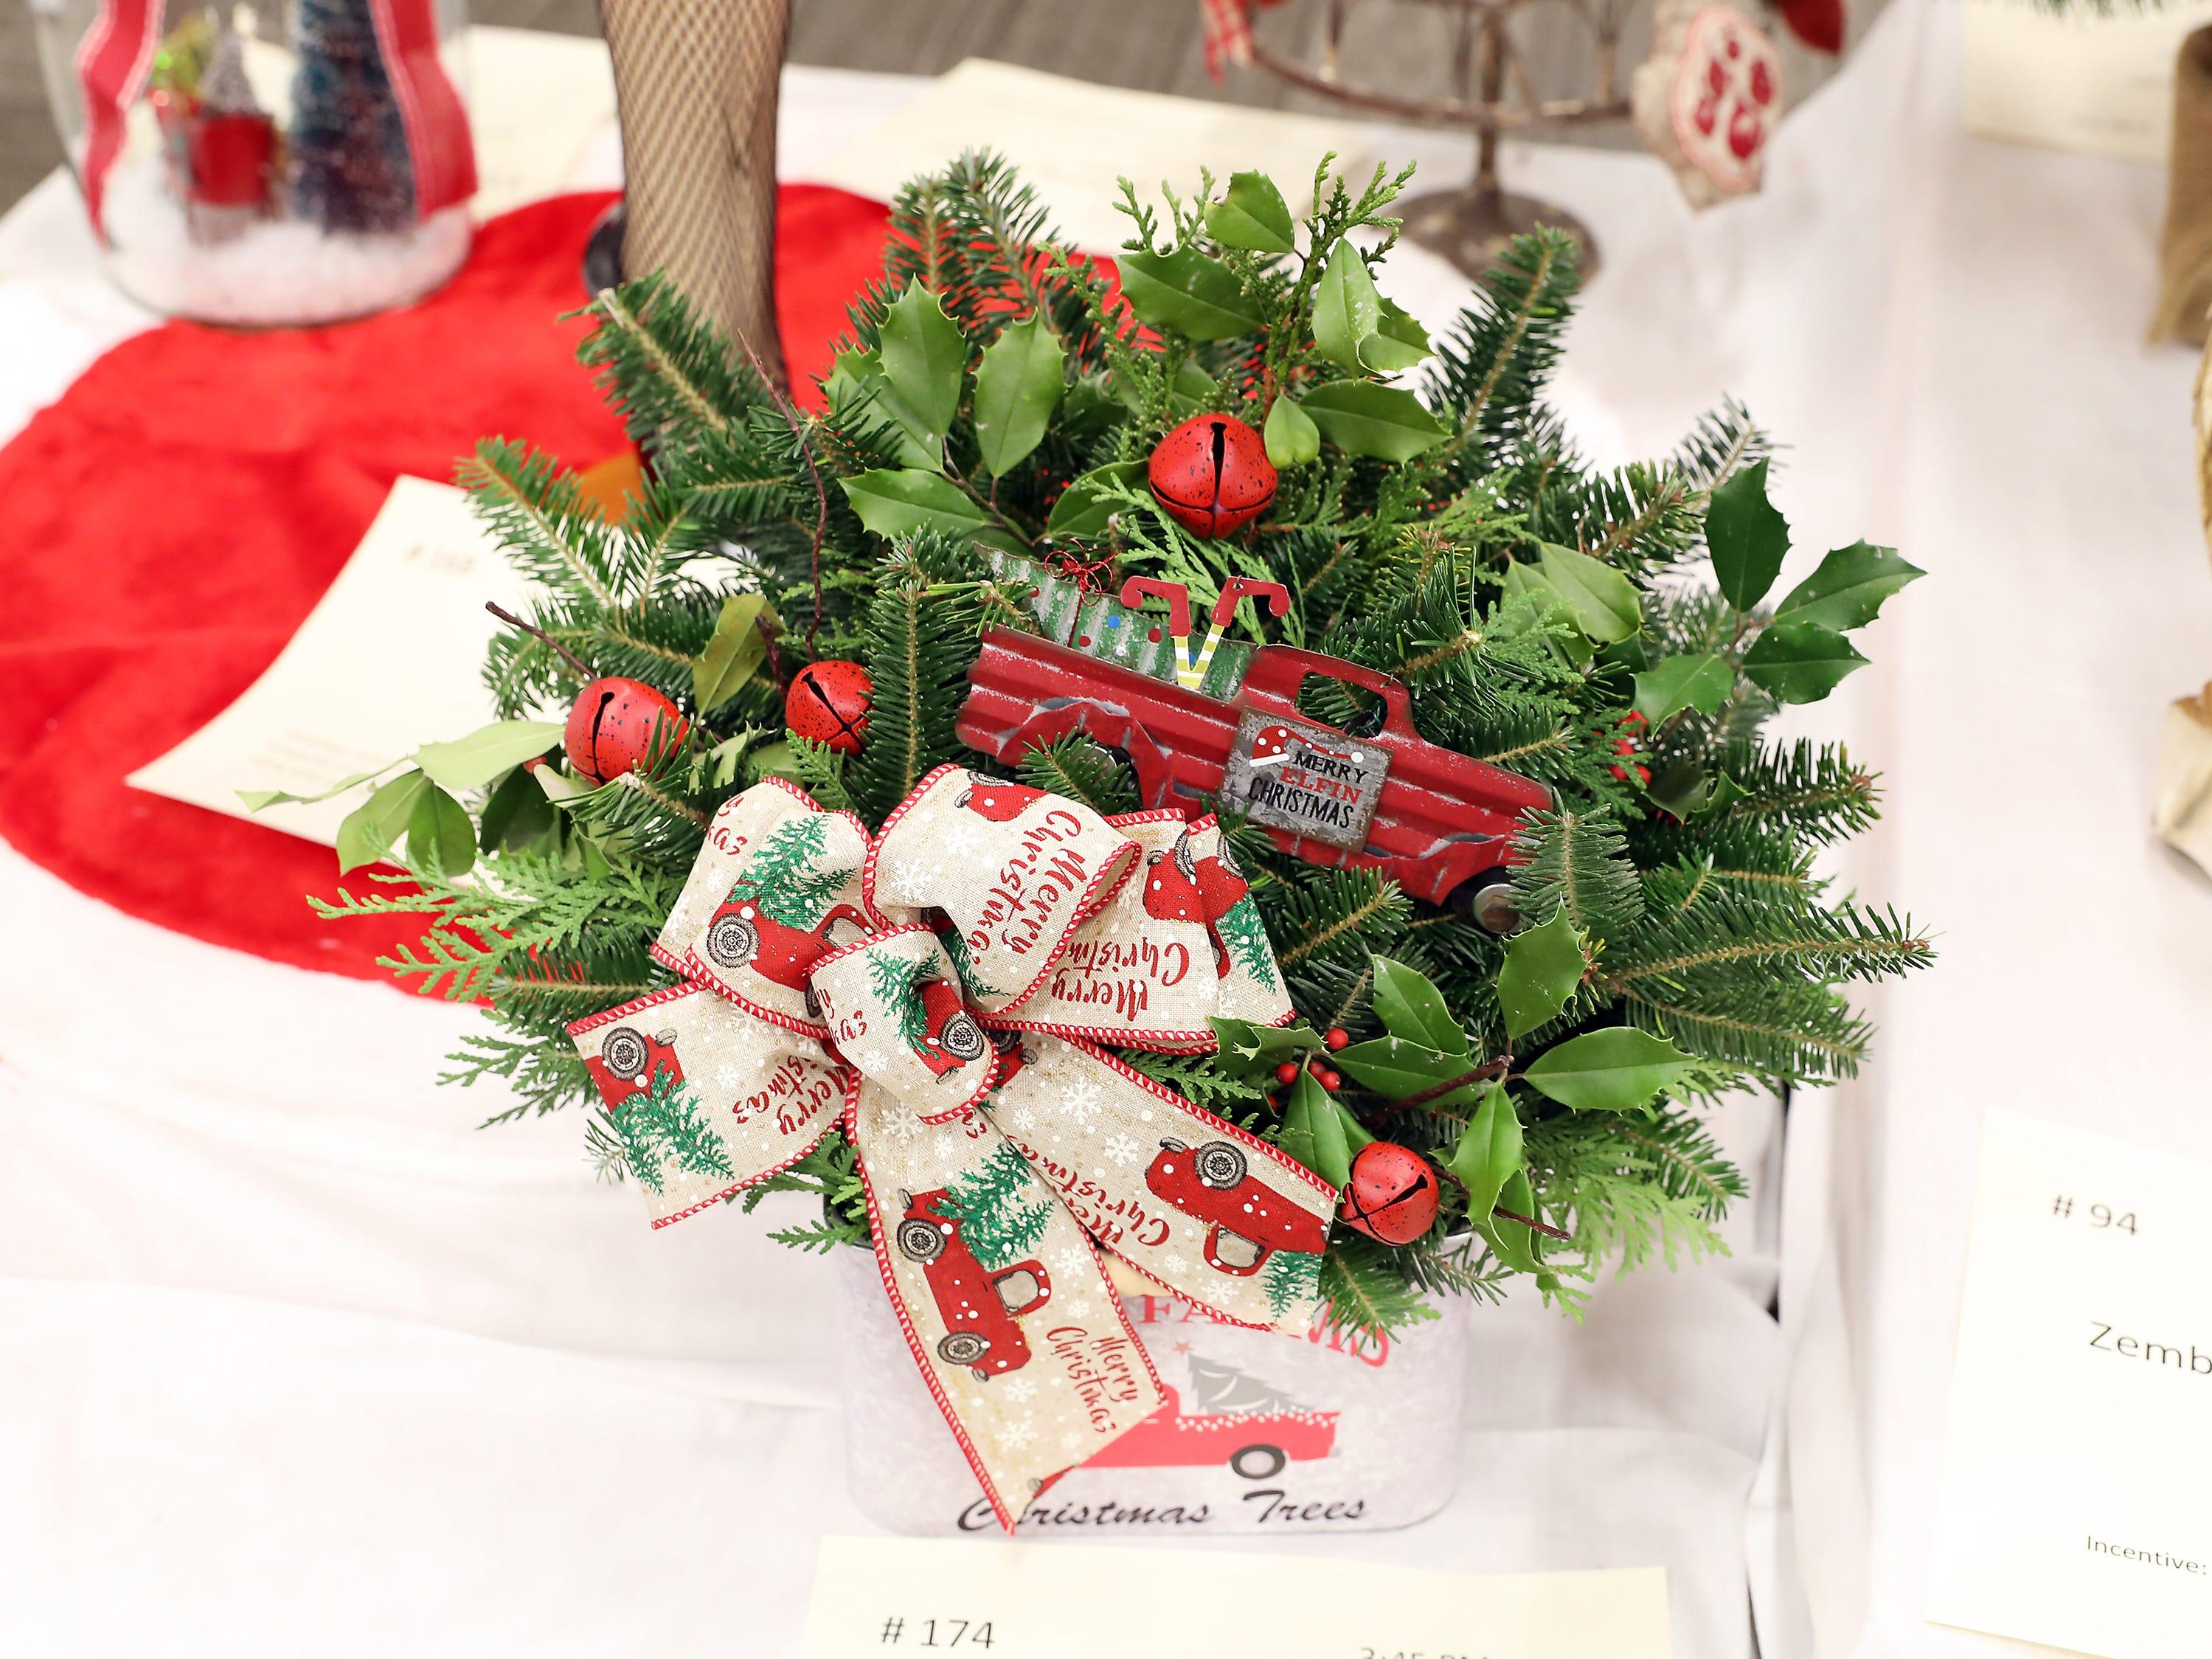 1743:45 PMDermatology of Southeastern OhioWreathHappy HolidaysA festive wreath.$200 towards cosmetic treatment, botox, dysport or fillers.